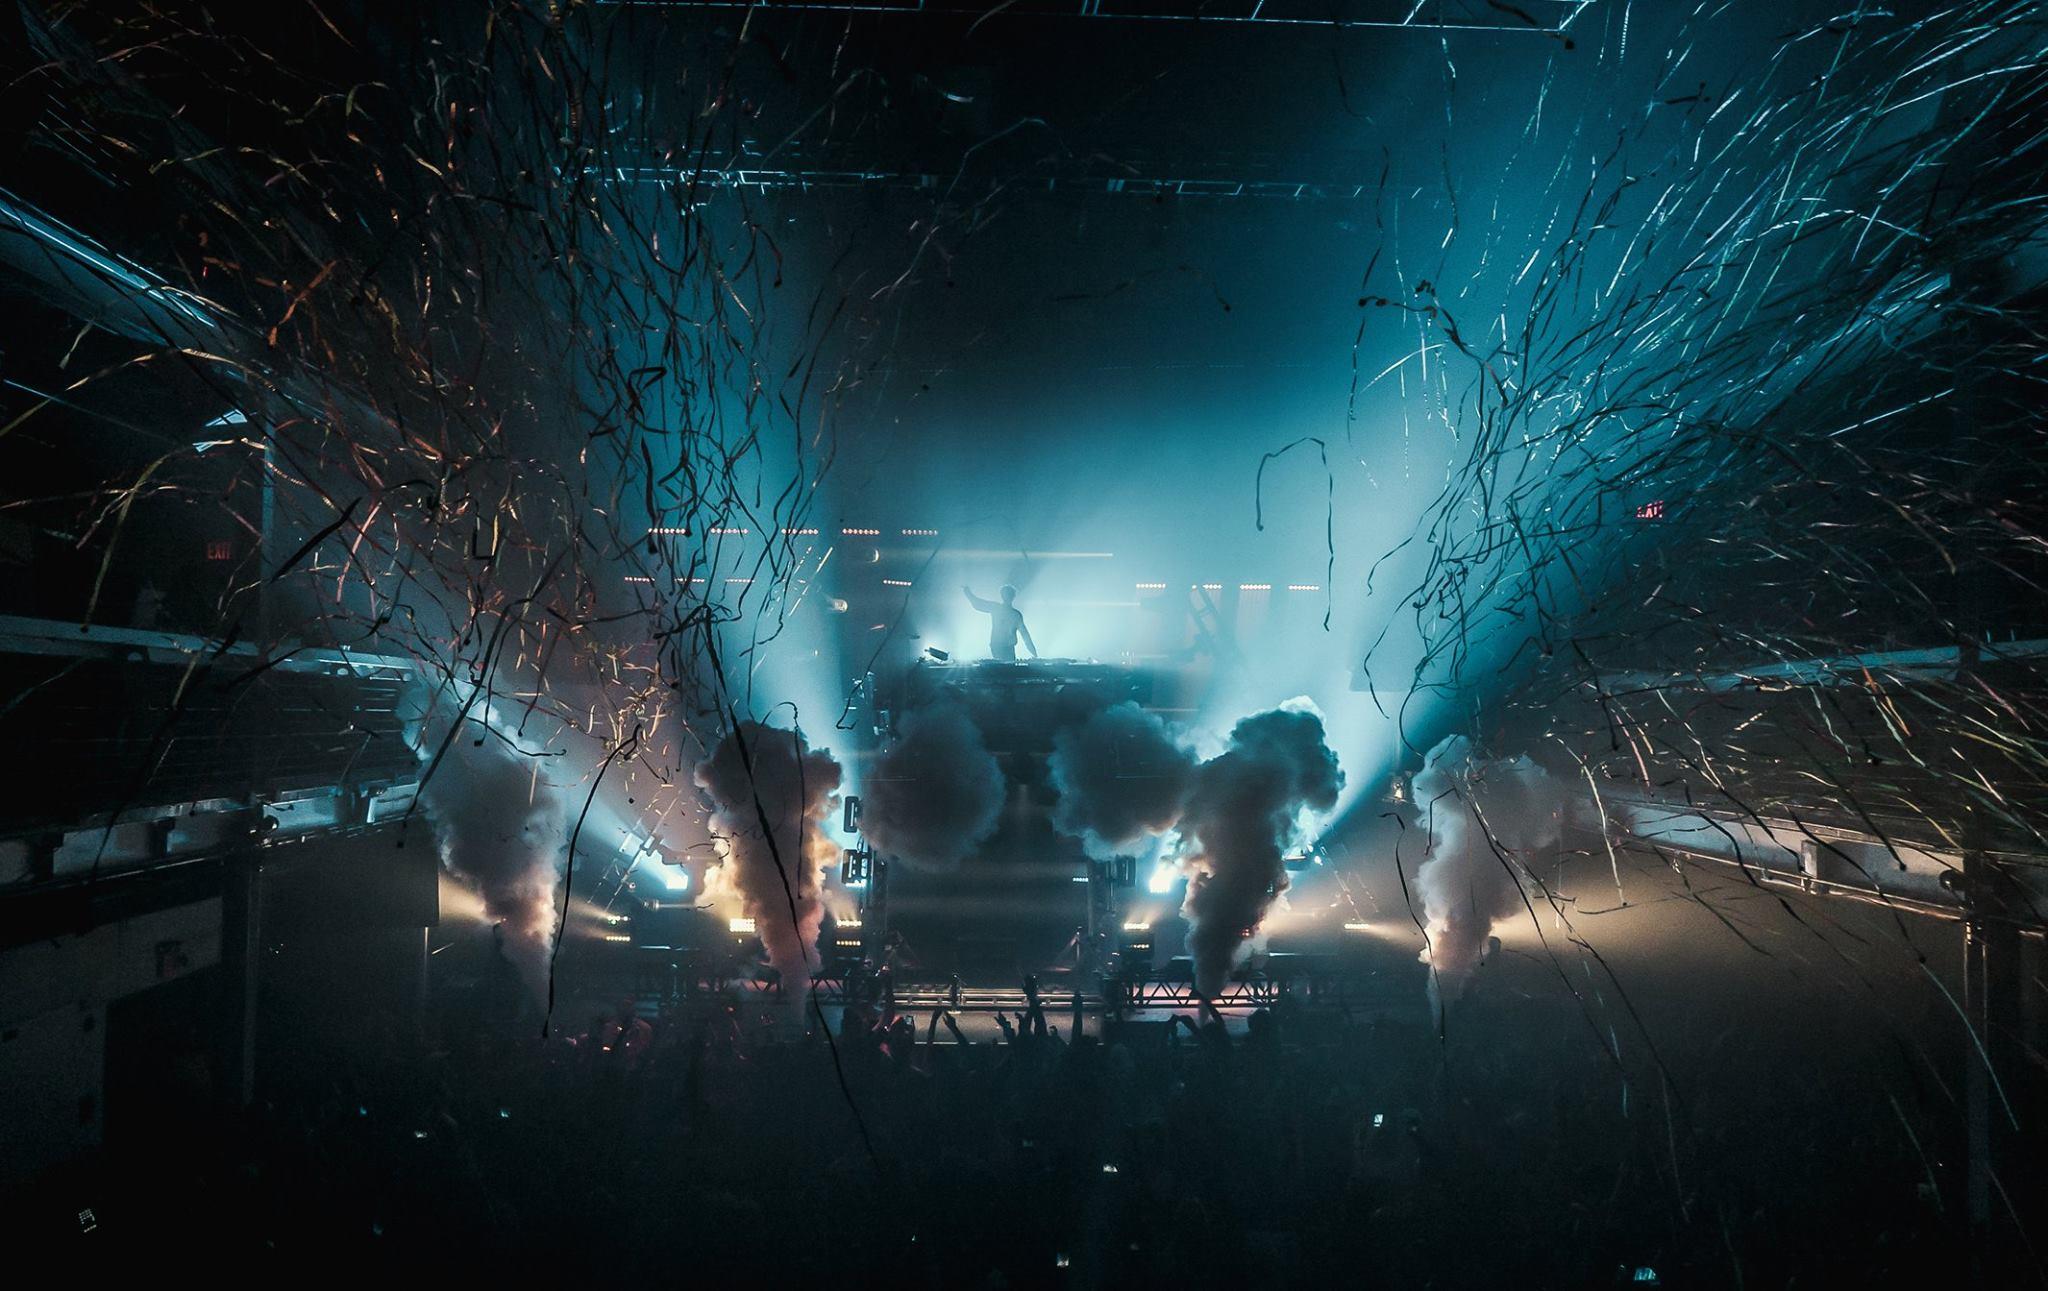 RL Grime Releases Spooky 'Halloween VI' Mix | EDM Identity